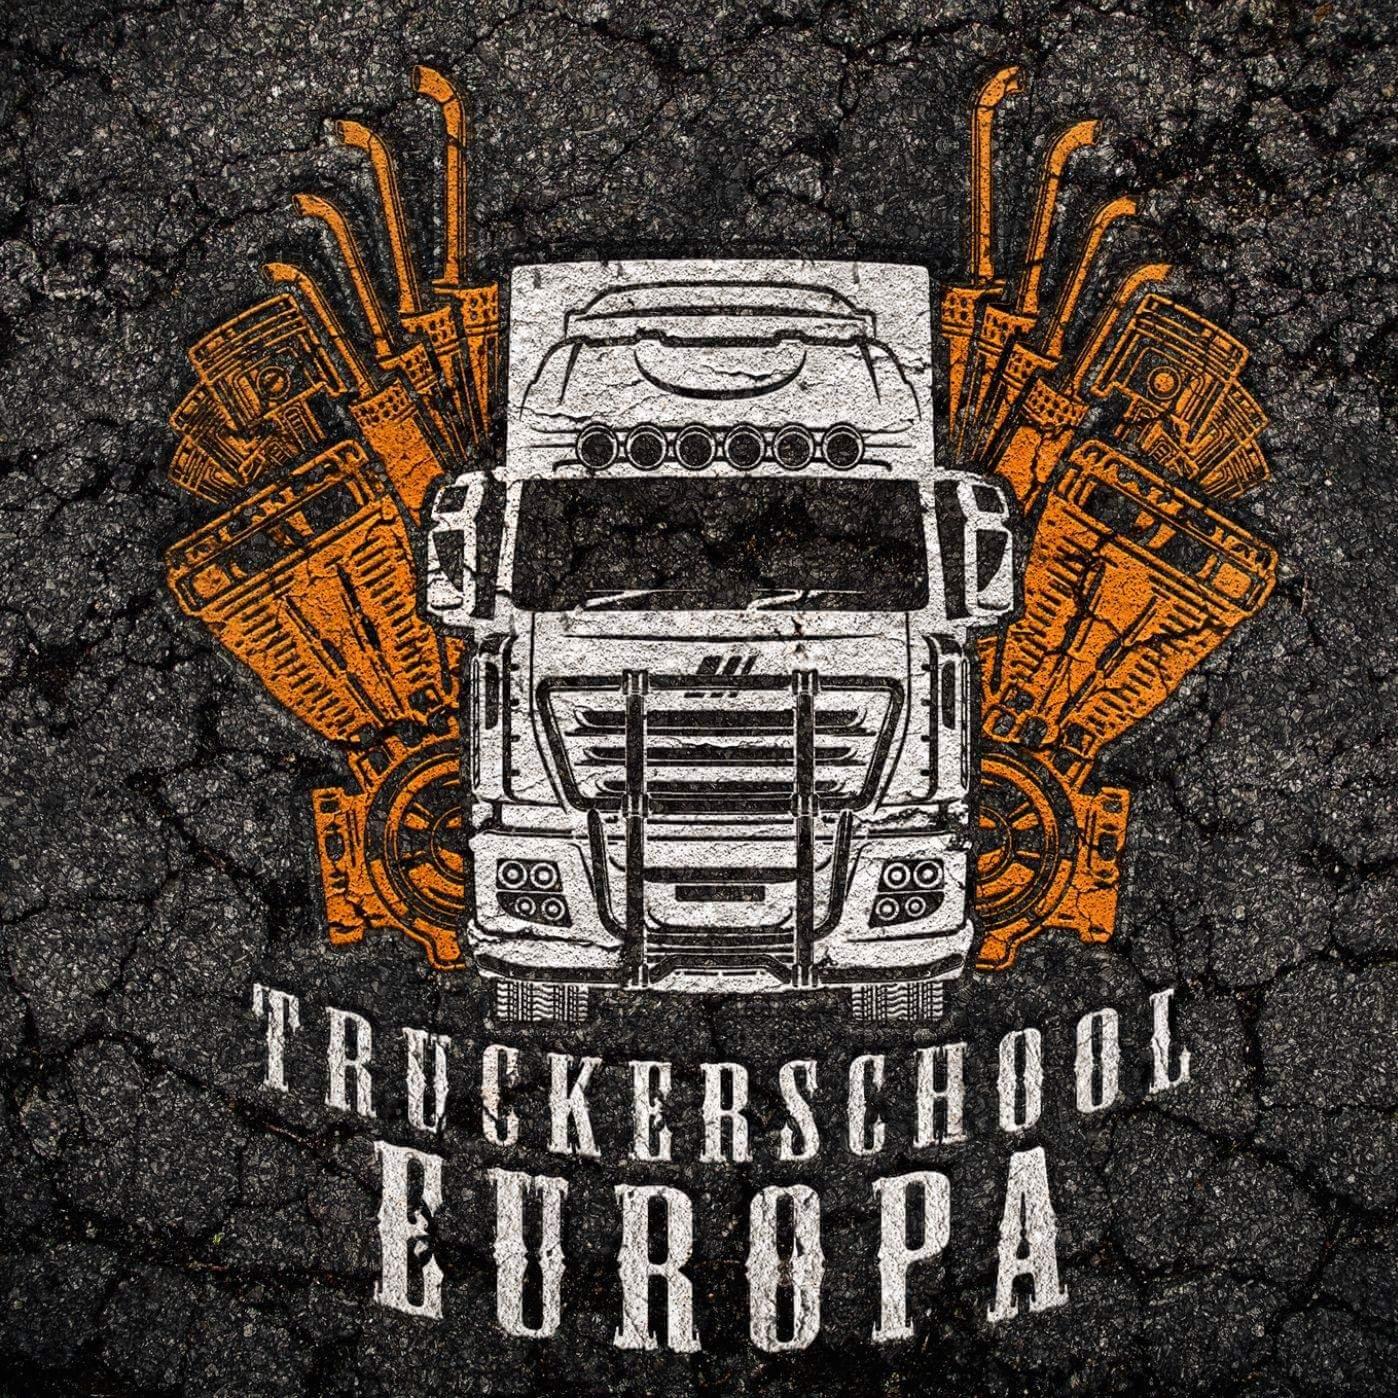 Fahrschule Europa